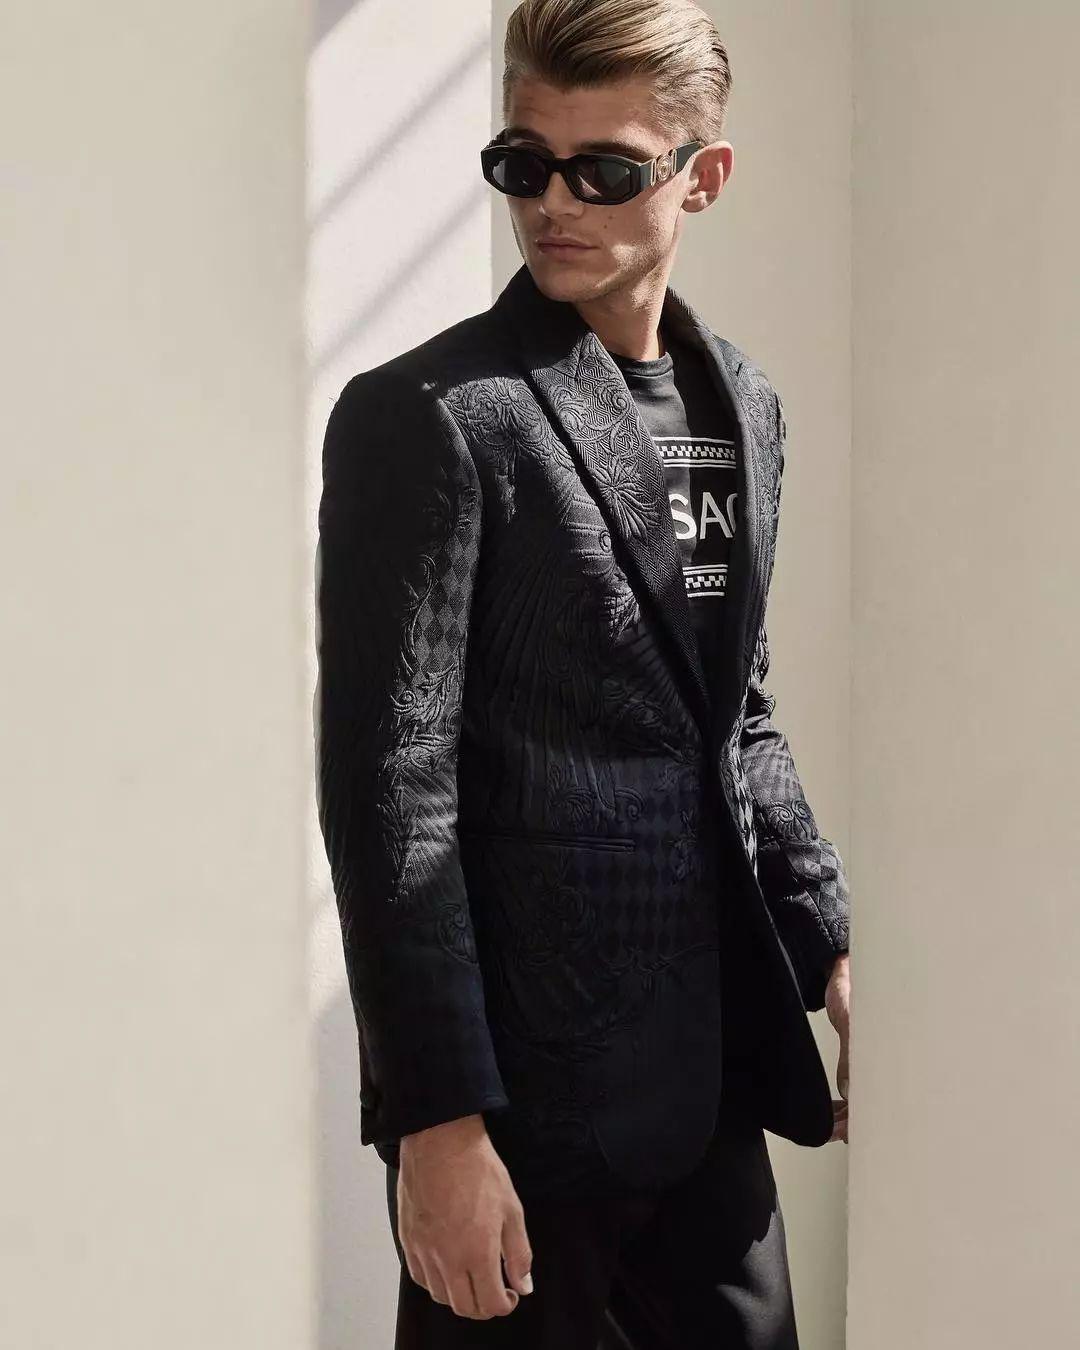 947ec7a4e4ec469ca53350551b87f418 - 被嘲笑路人长相的搞笑网红Twan Kuyper,成为Versace代言人